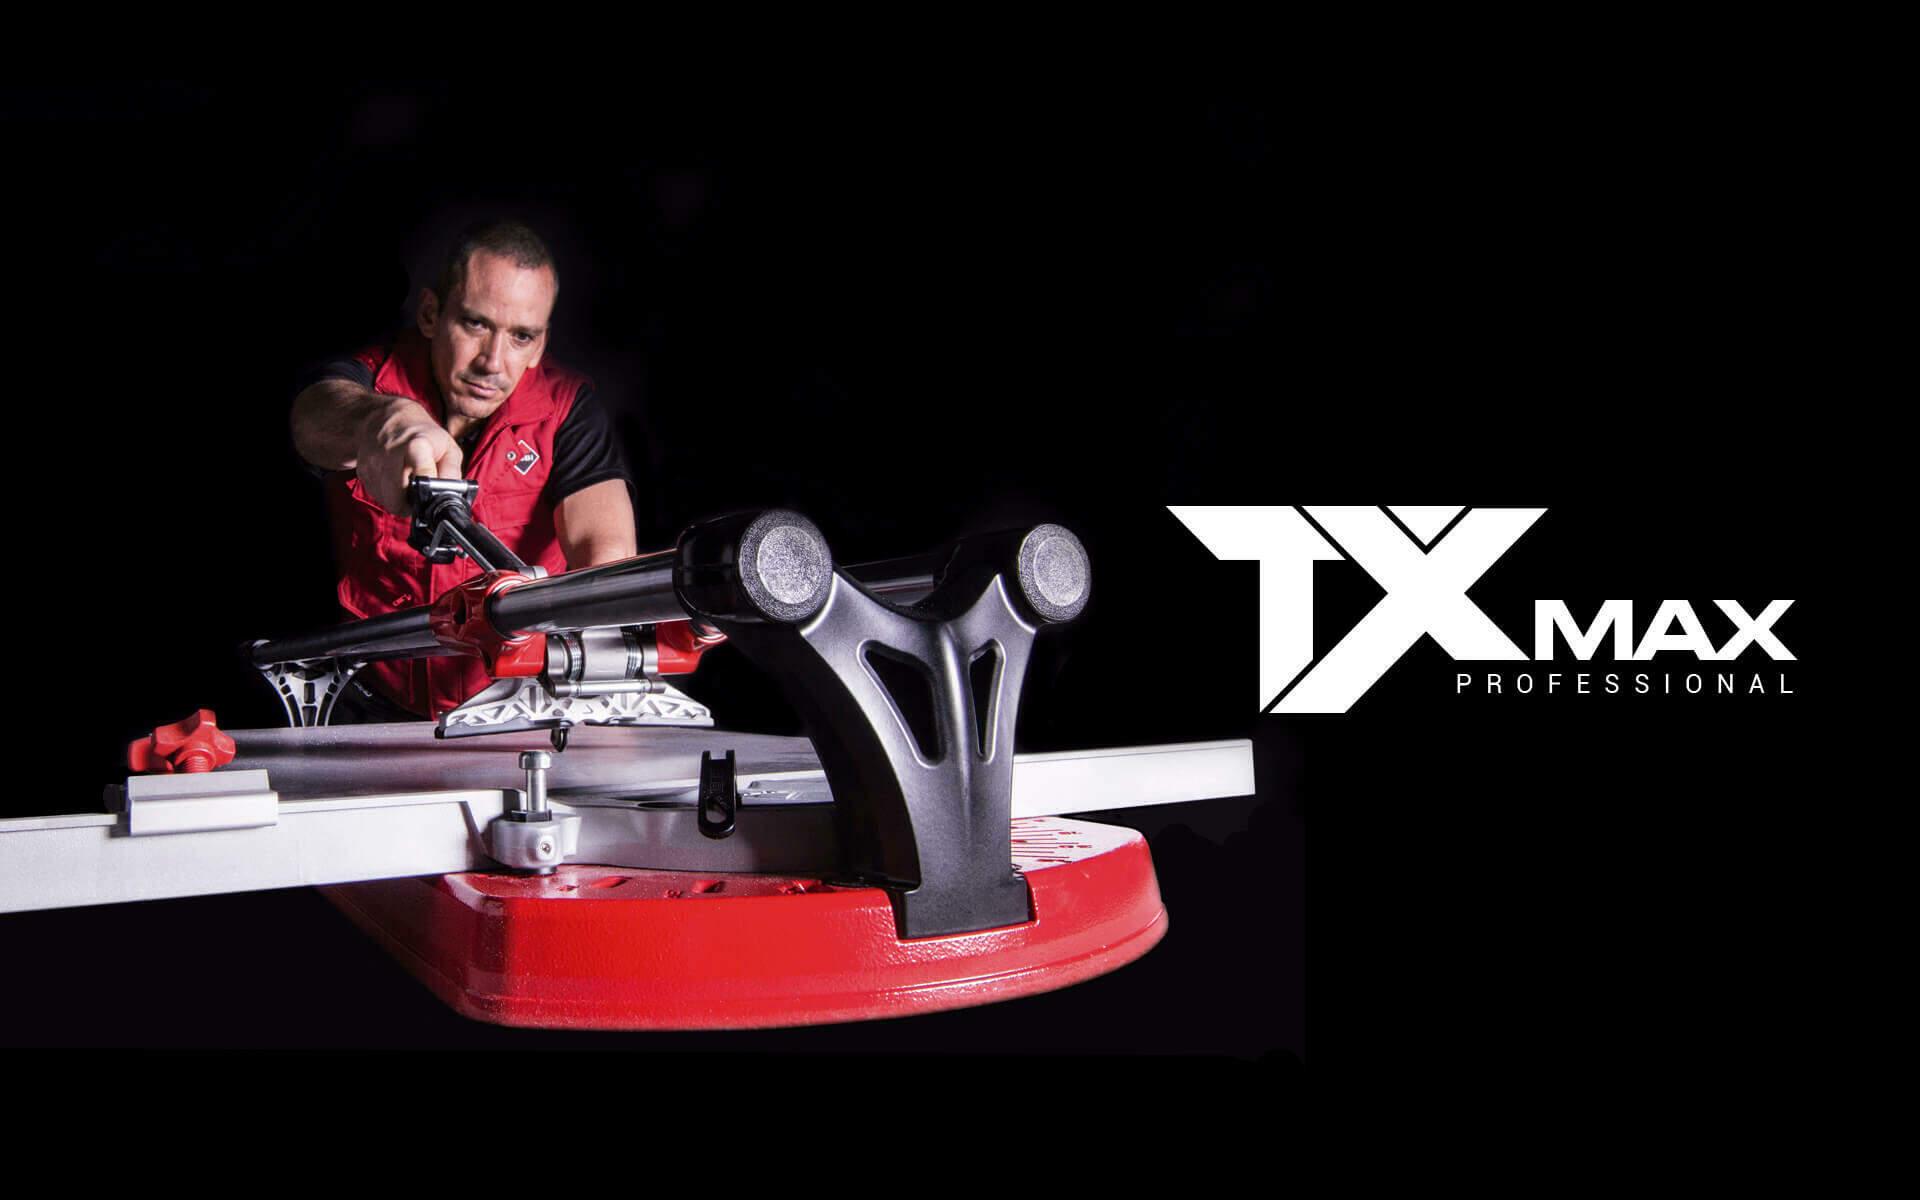 TX-MAX, a new generation of RUBI cutters